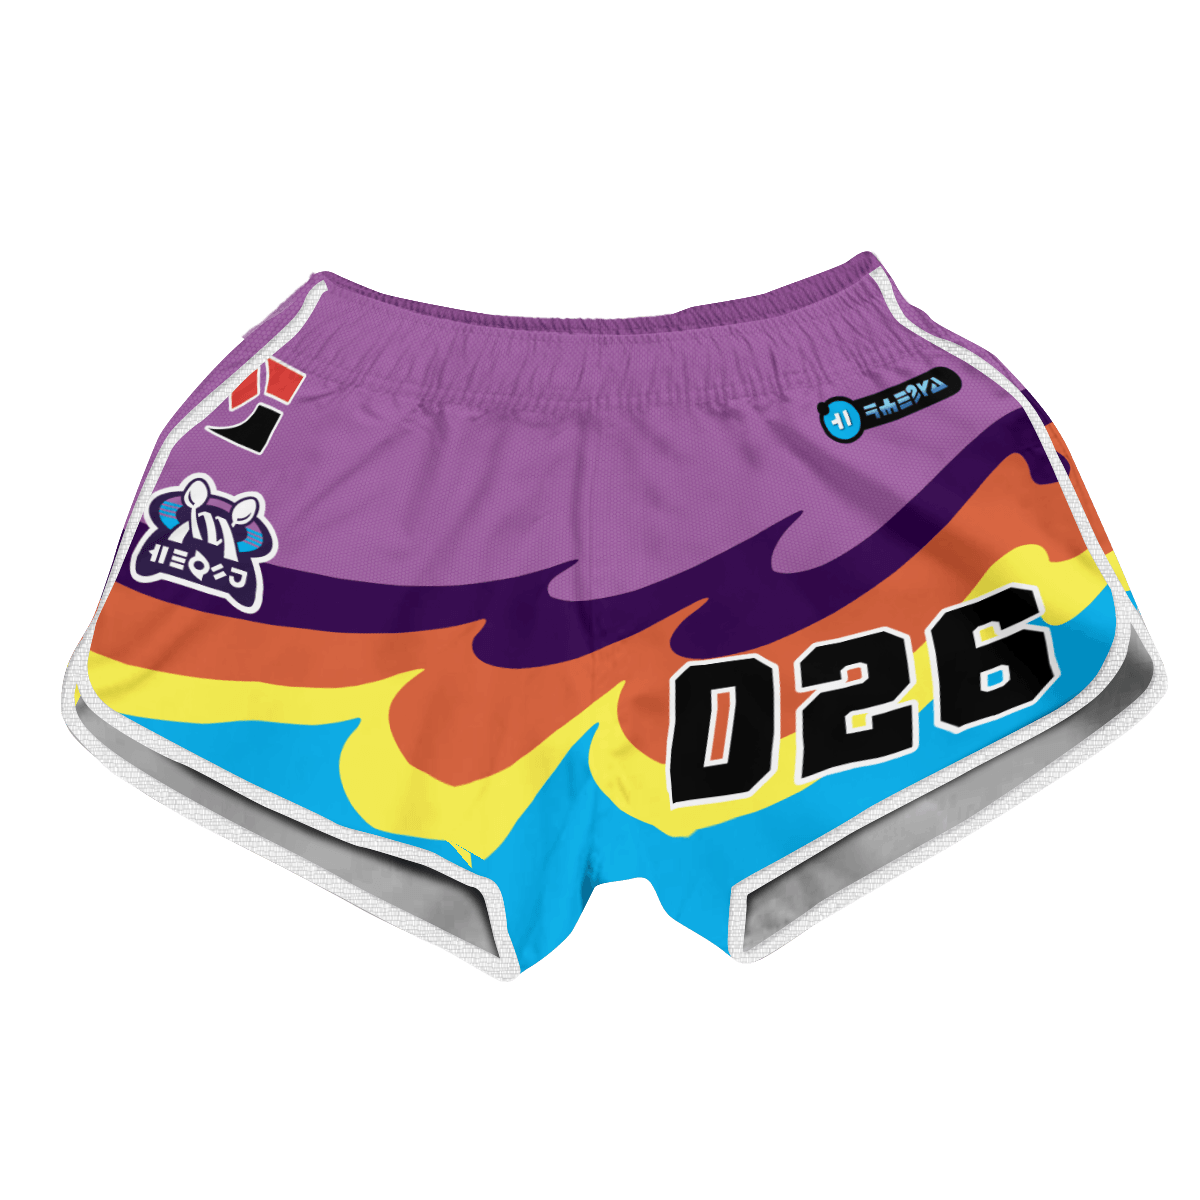 Pokemon Psychic Uniform Women Beach Shorts FDM3107 XS Official Anime Swimsuit Merch